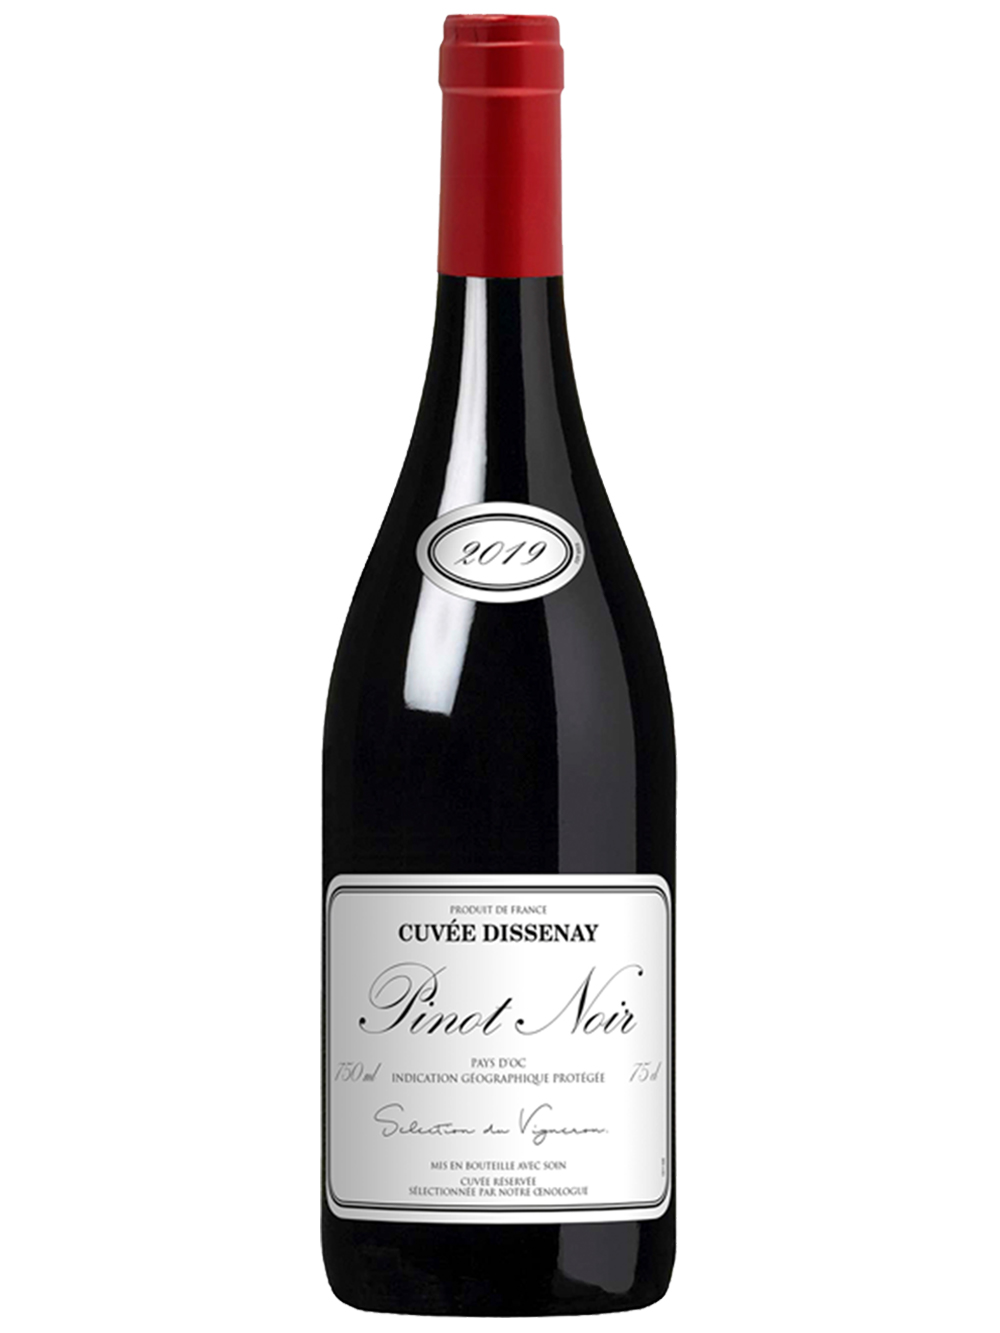 Cuvée Dissenay Pinot Noir